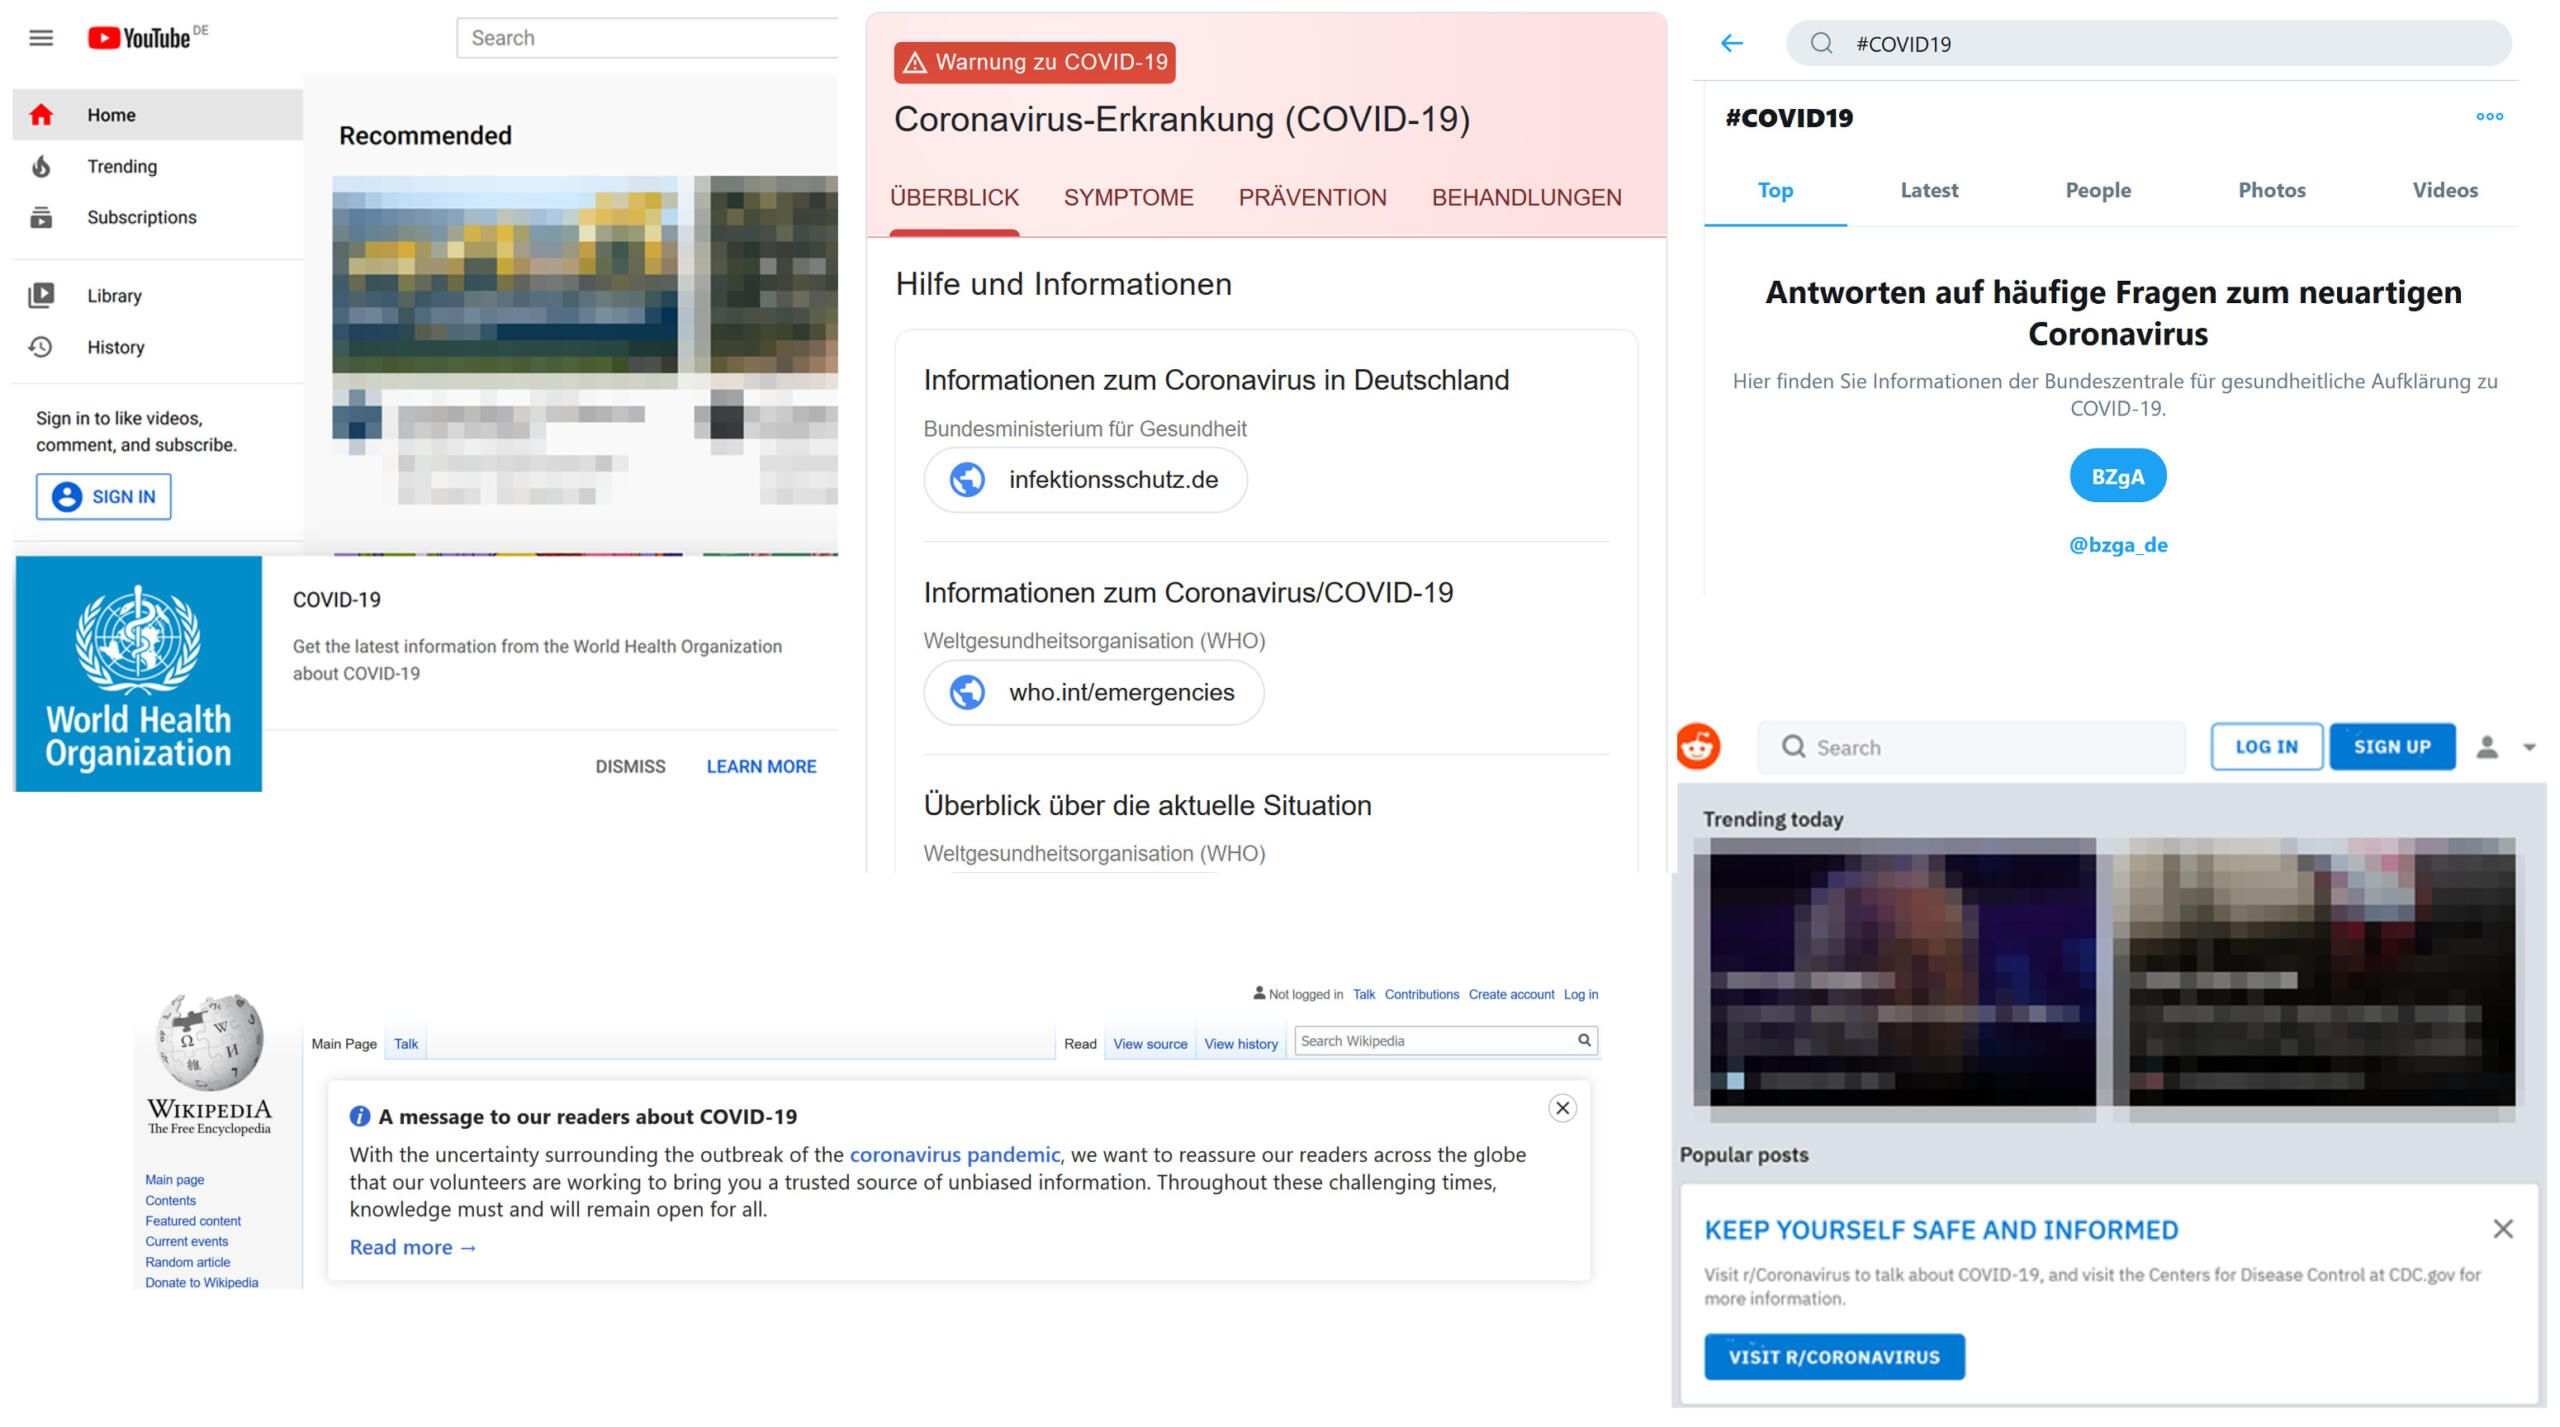 Screenshots von Corona-Hinweisen auf YouTube, Google, Twitter, Wikipedia, Reddit